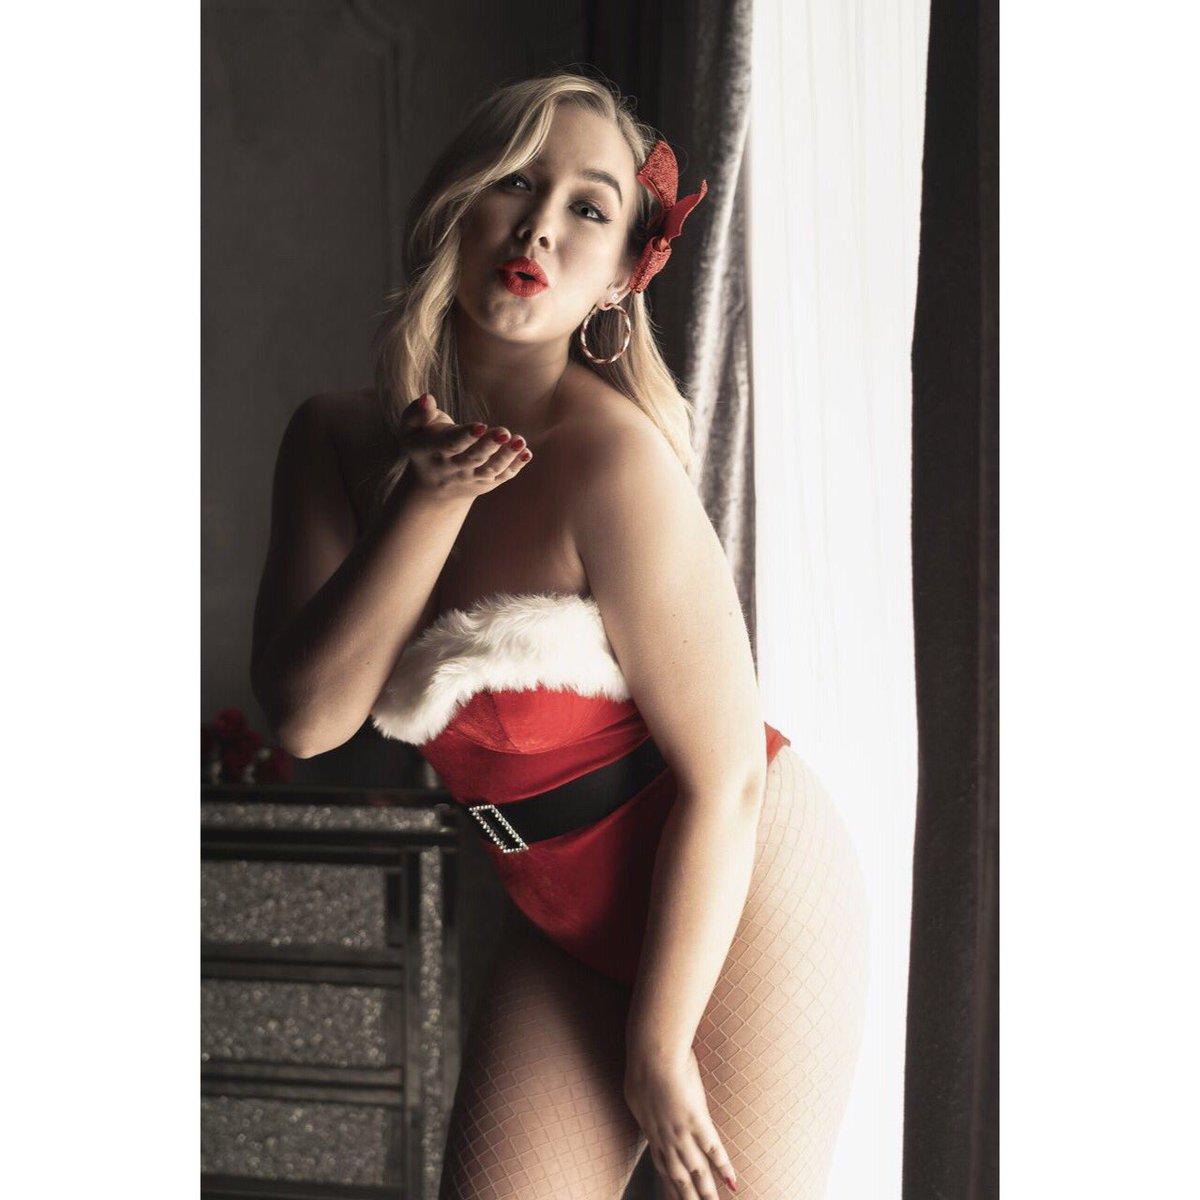 Karma's got a kiss for you 😘 #santa #christmas #stockings #fishnets #bodysuit @annsummers #kisses #karma #love #redlips #blondie #candycane #photographer @evoimages #ukmodel #mua @amandaborgmua